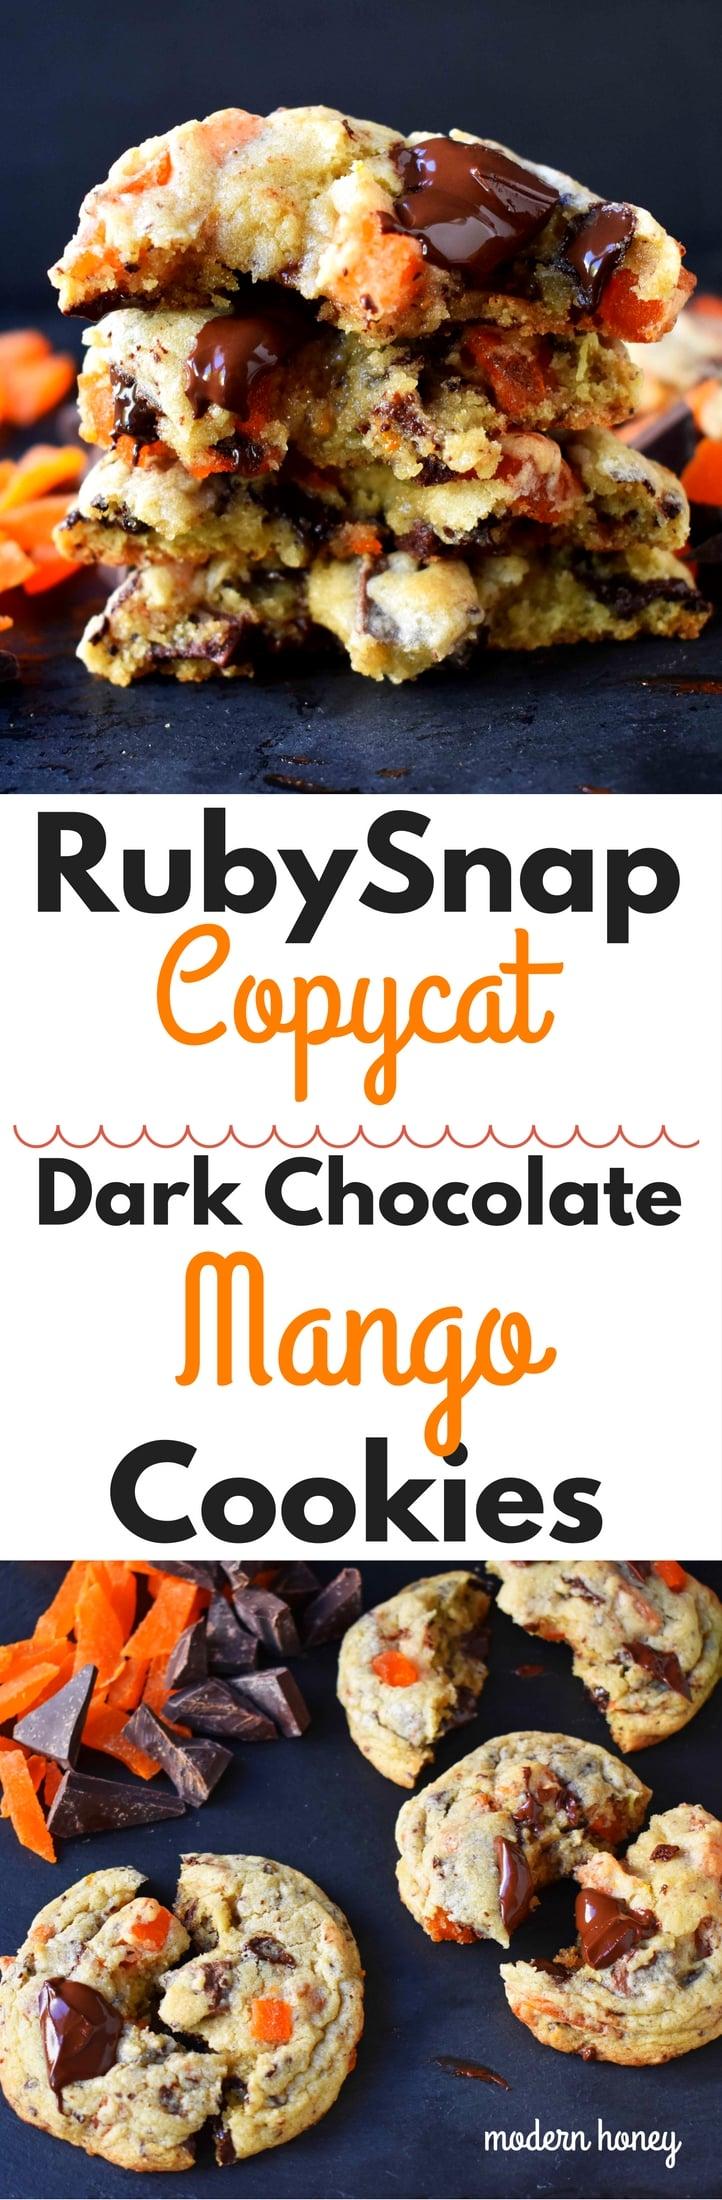 RubySnap Vivianna Dark Chocolate Mango Cookies by Modern Honey. Citrus dough cookies studded with dark chocolate and mango. A highly addicting cookie from this popular bakery. www.modernhoney.com